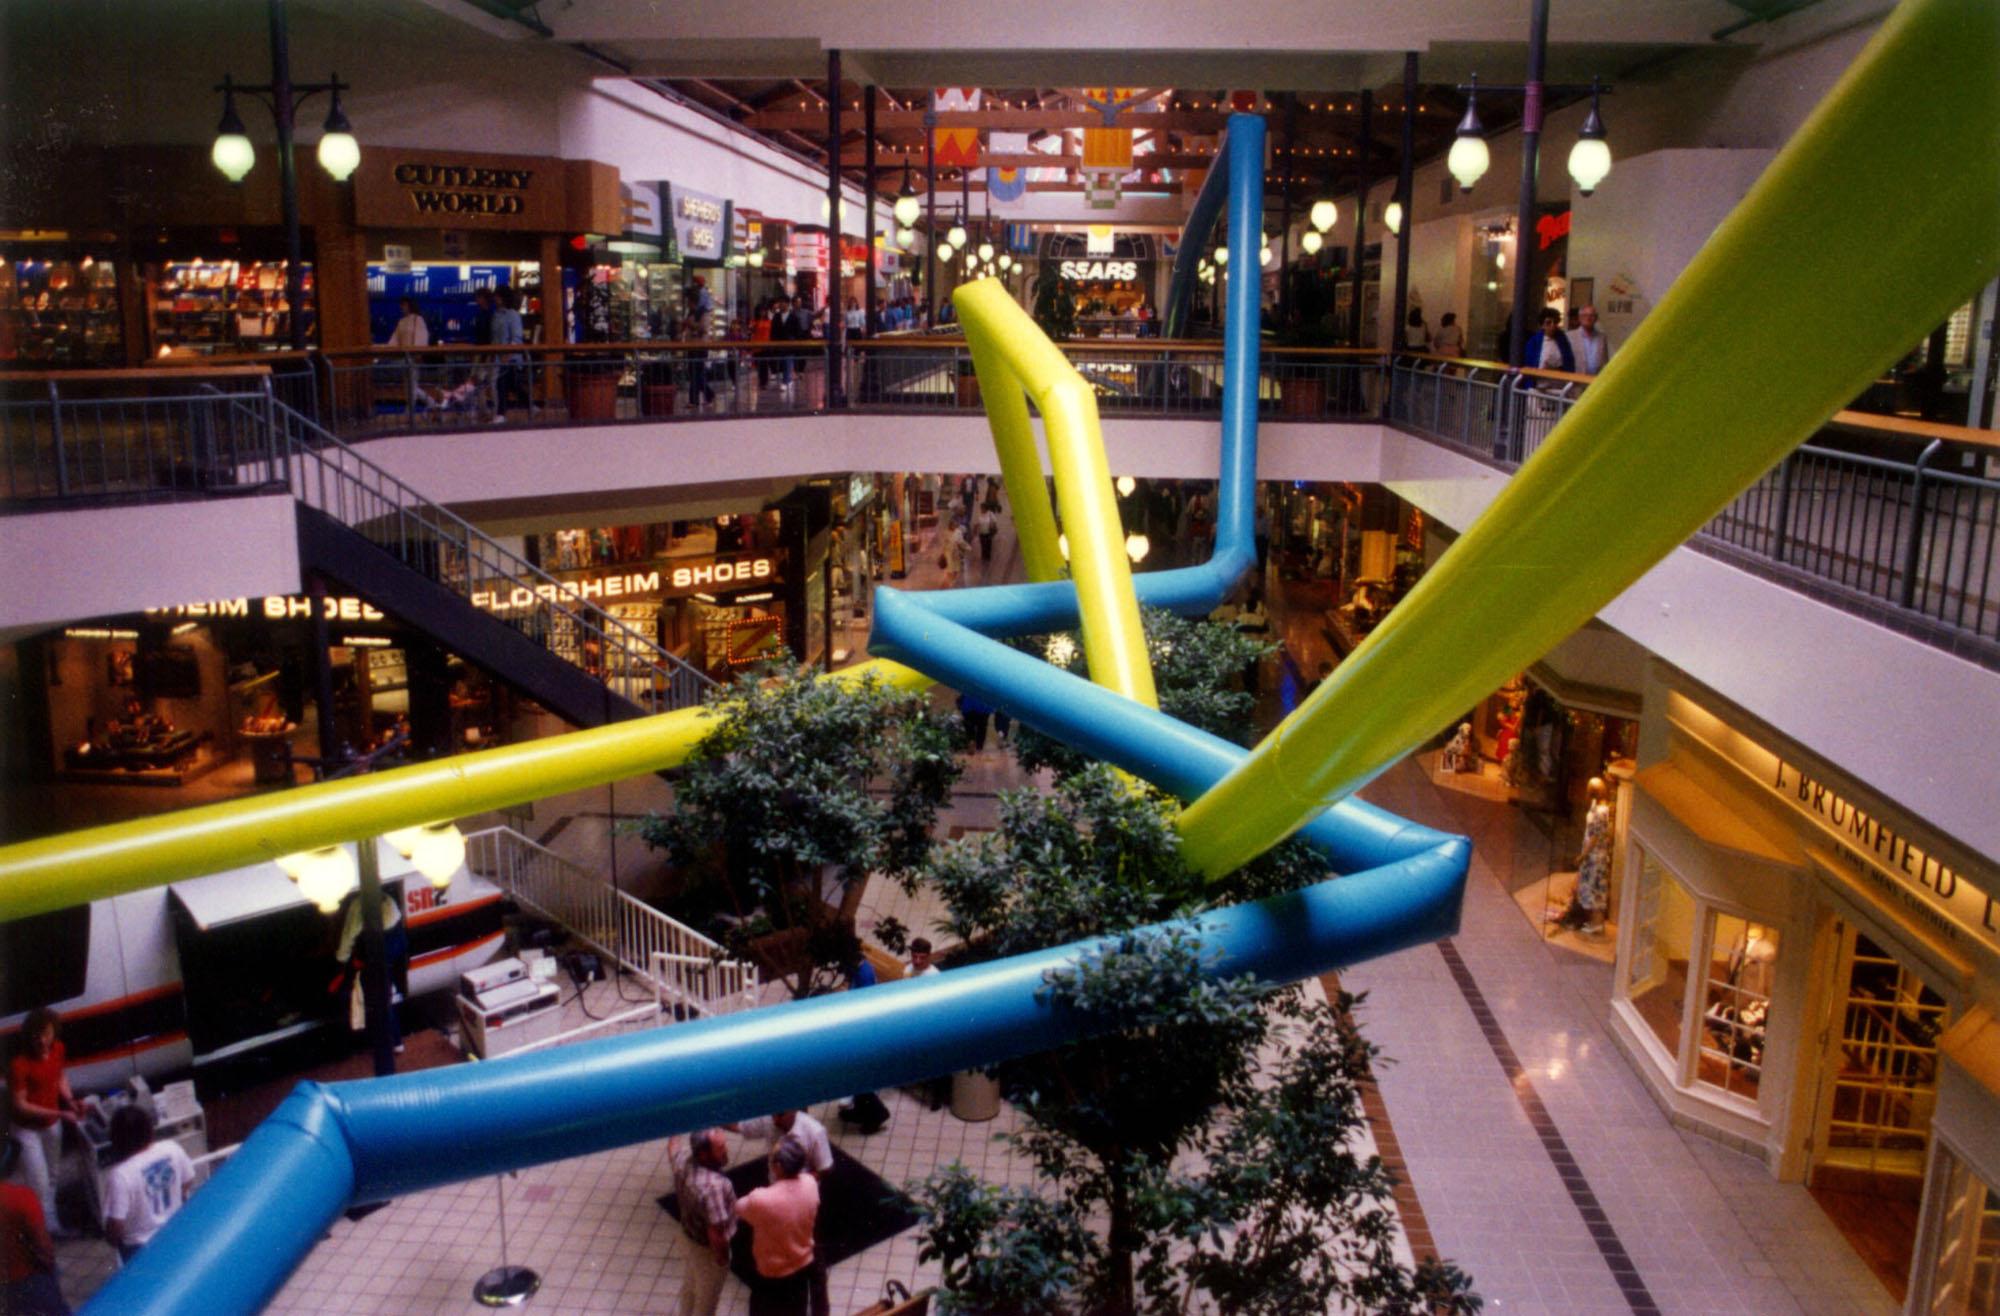 021-North-County-Mall-CA.jpg